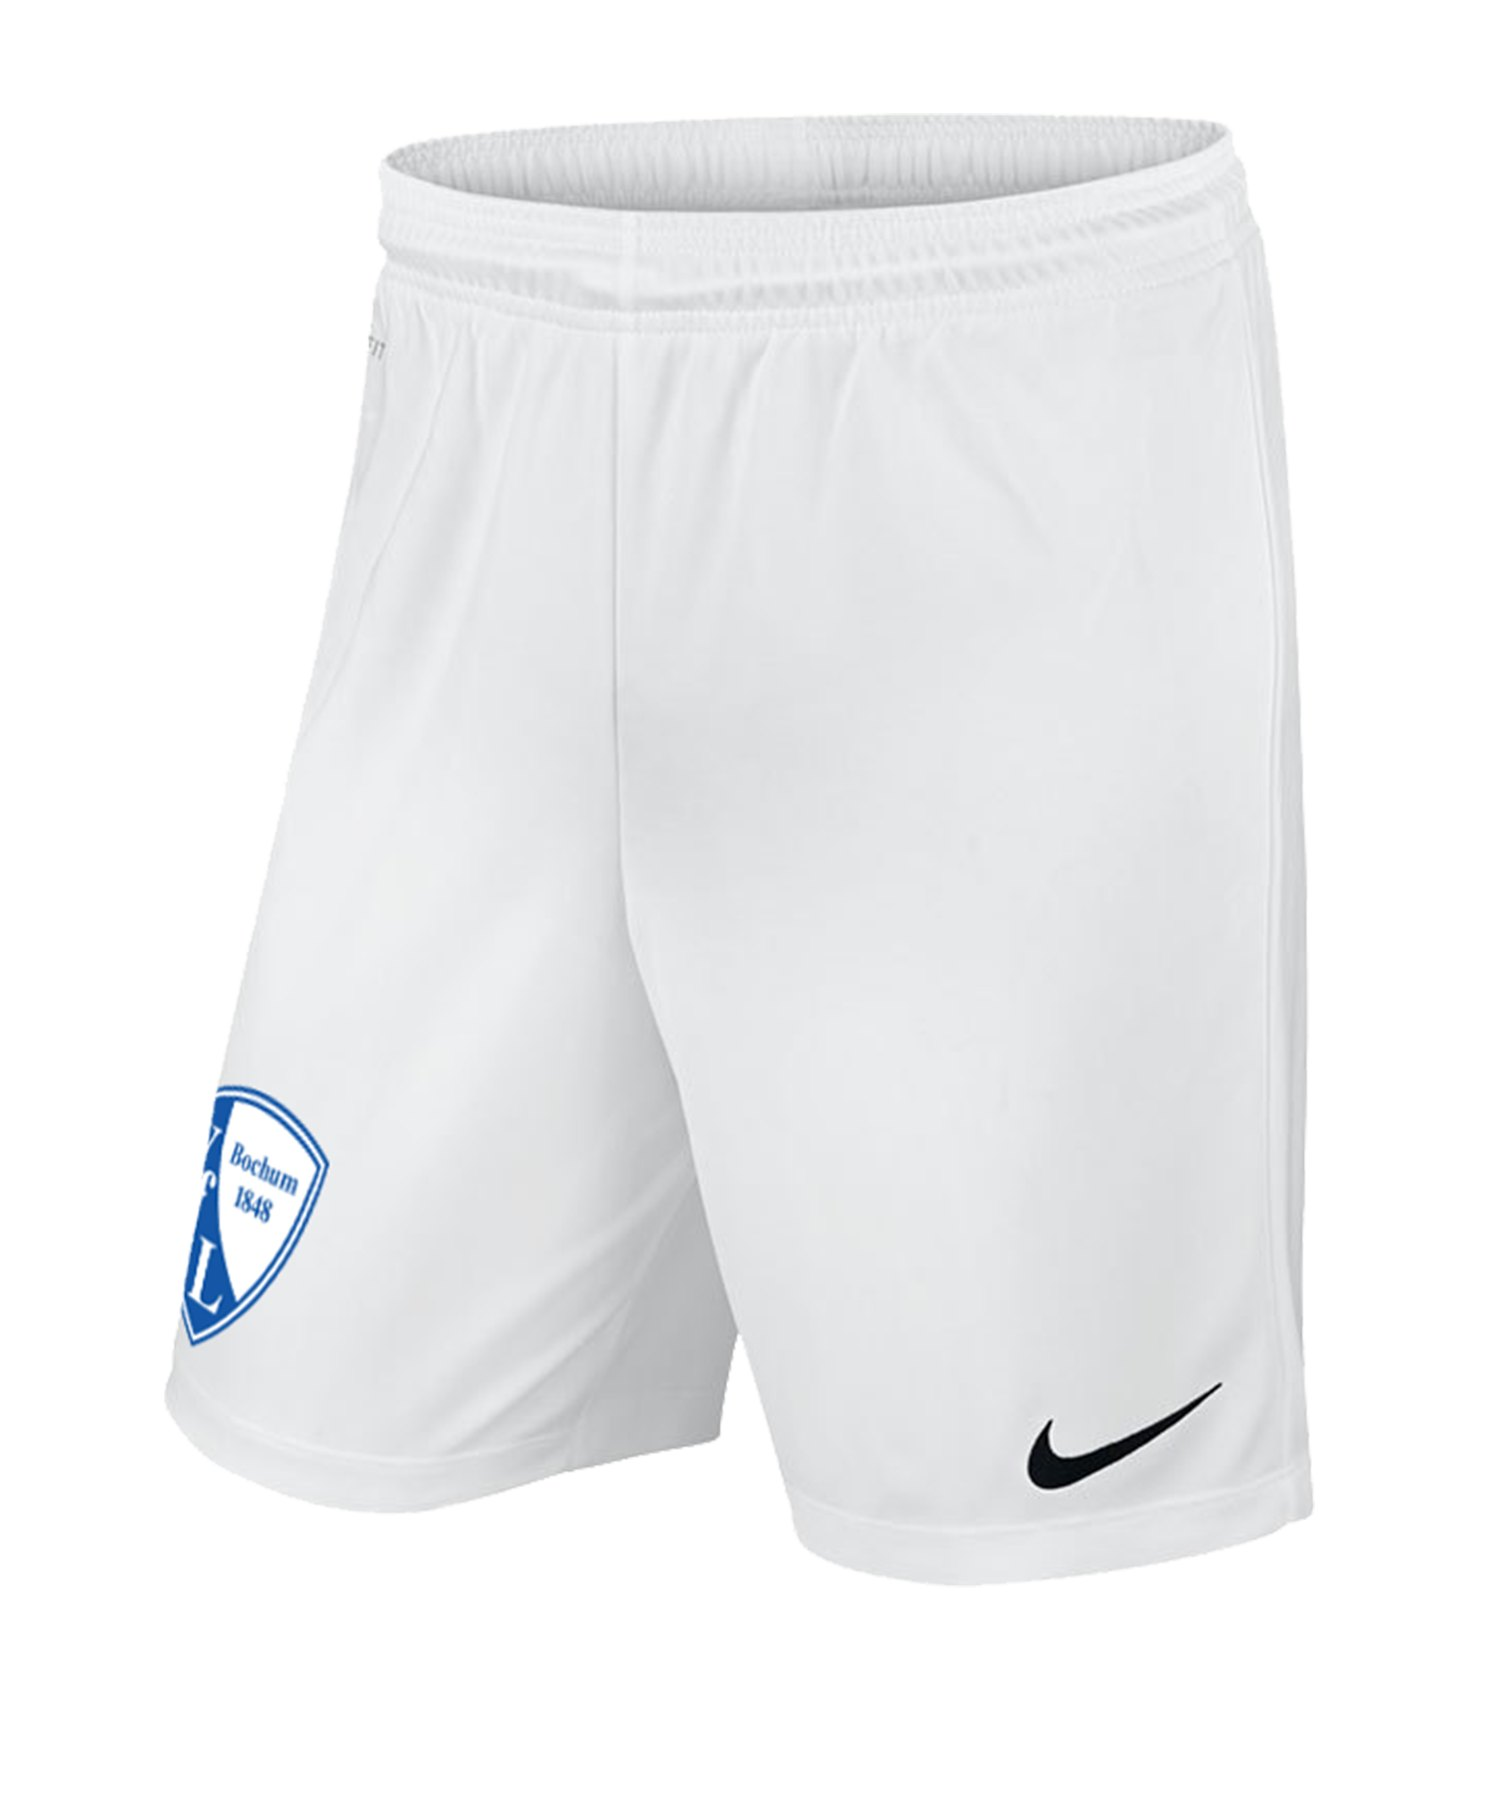 Nike VfL Bochum Short Home 2019/2020 Kids F100 - weiss